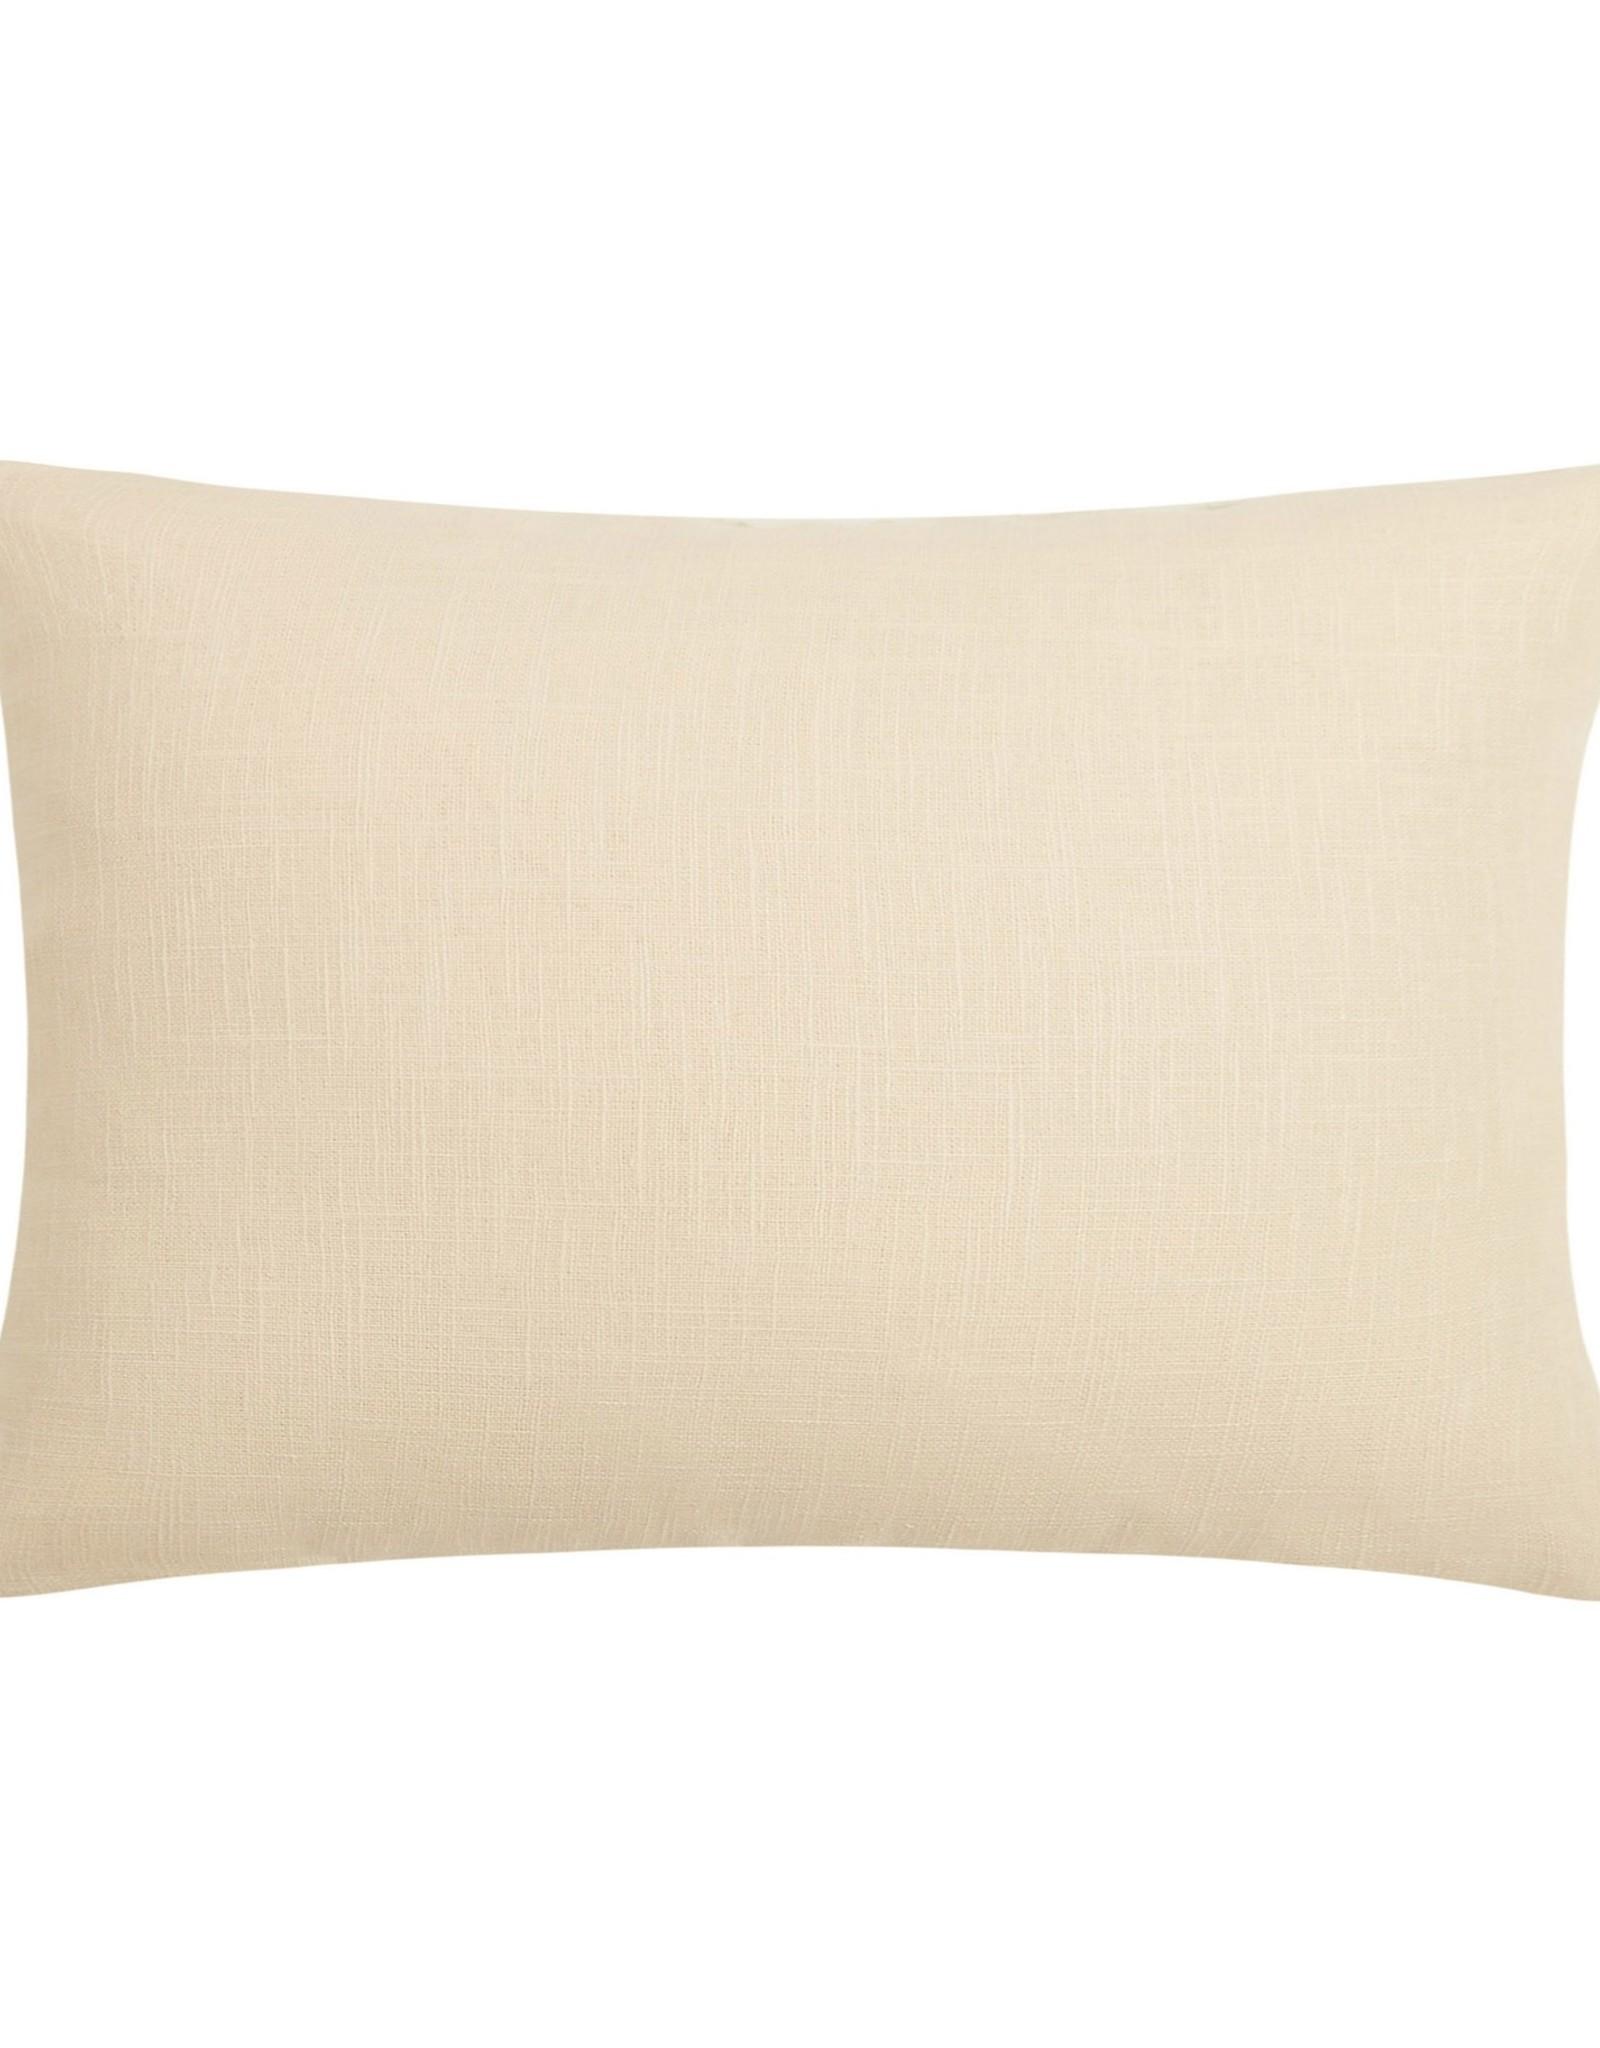 Peking Handcraft Pillow - New York Embroidered